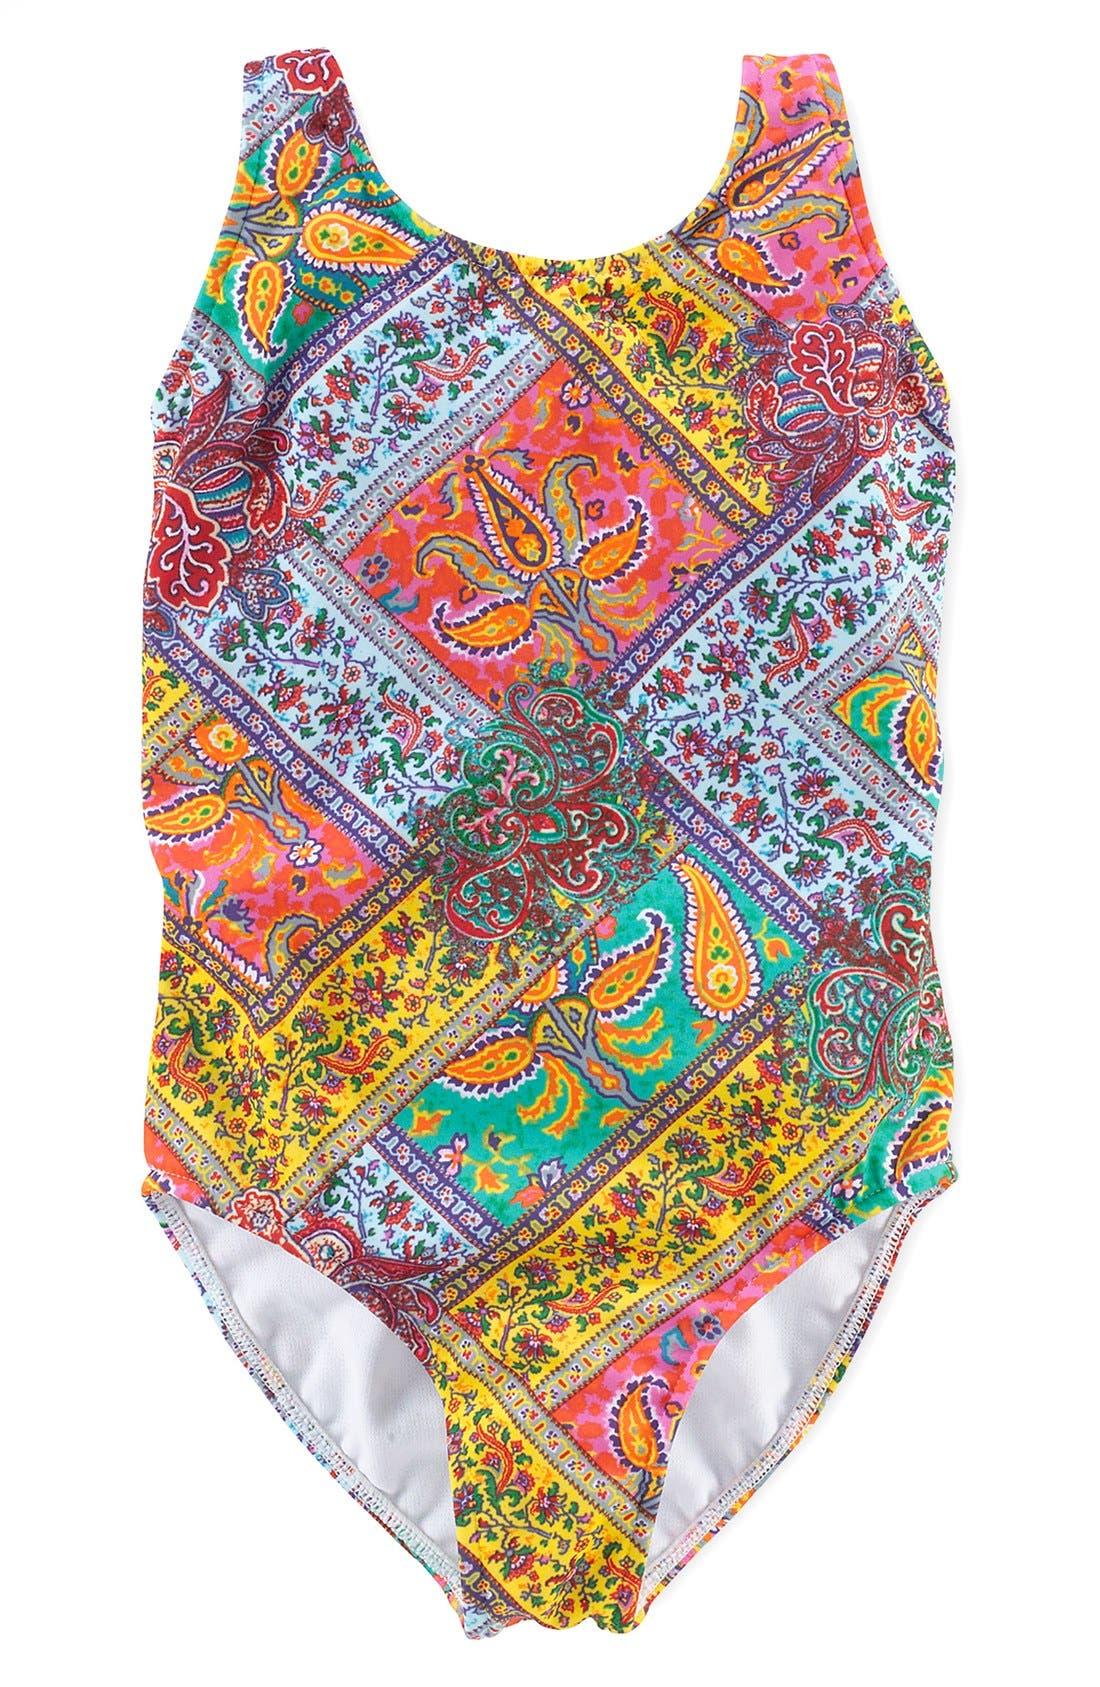 Alternate Image 1 Selected - Ralph Lauren One-Piece Swimsuit (Toddler Girls)